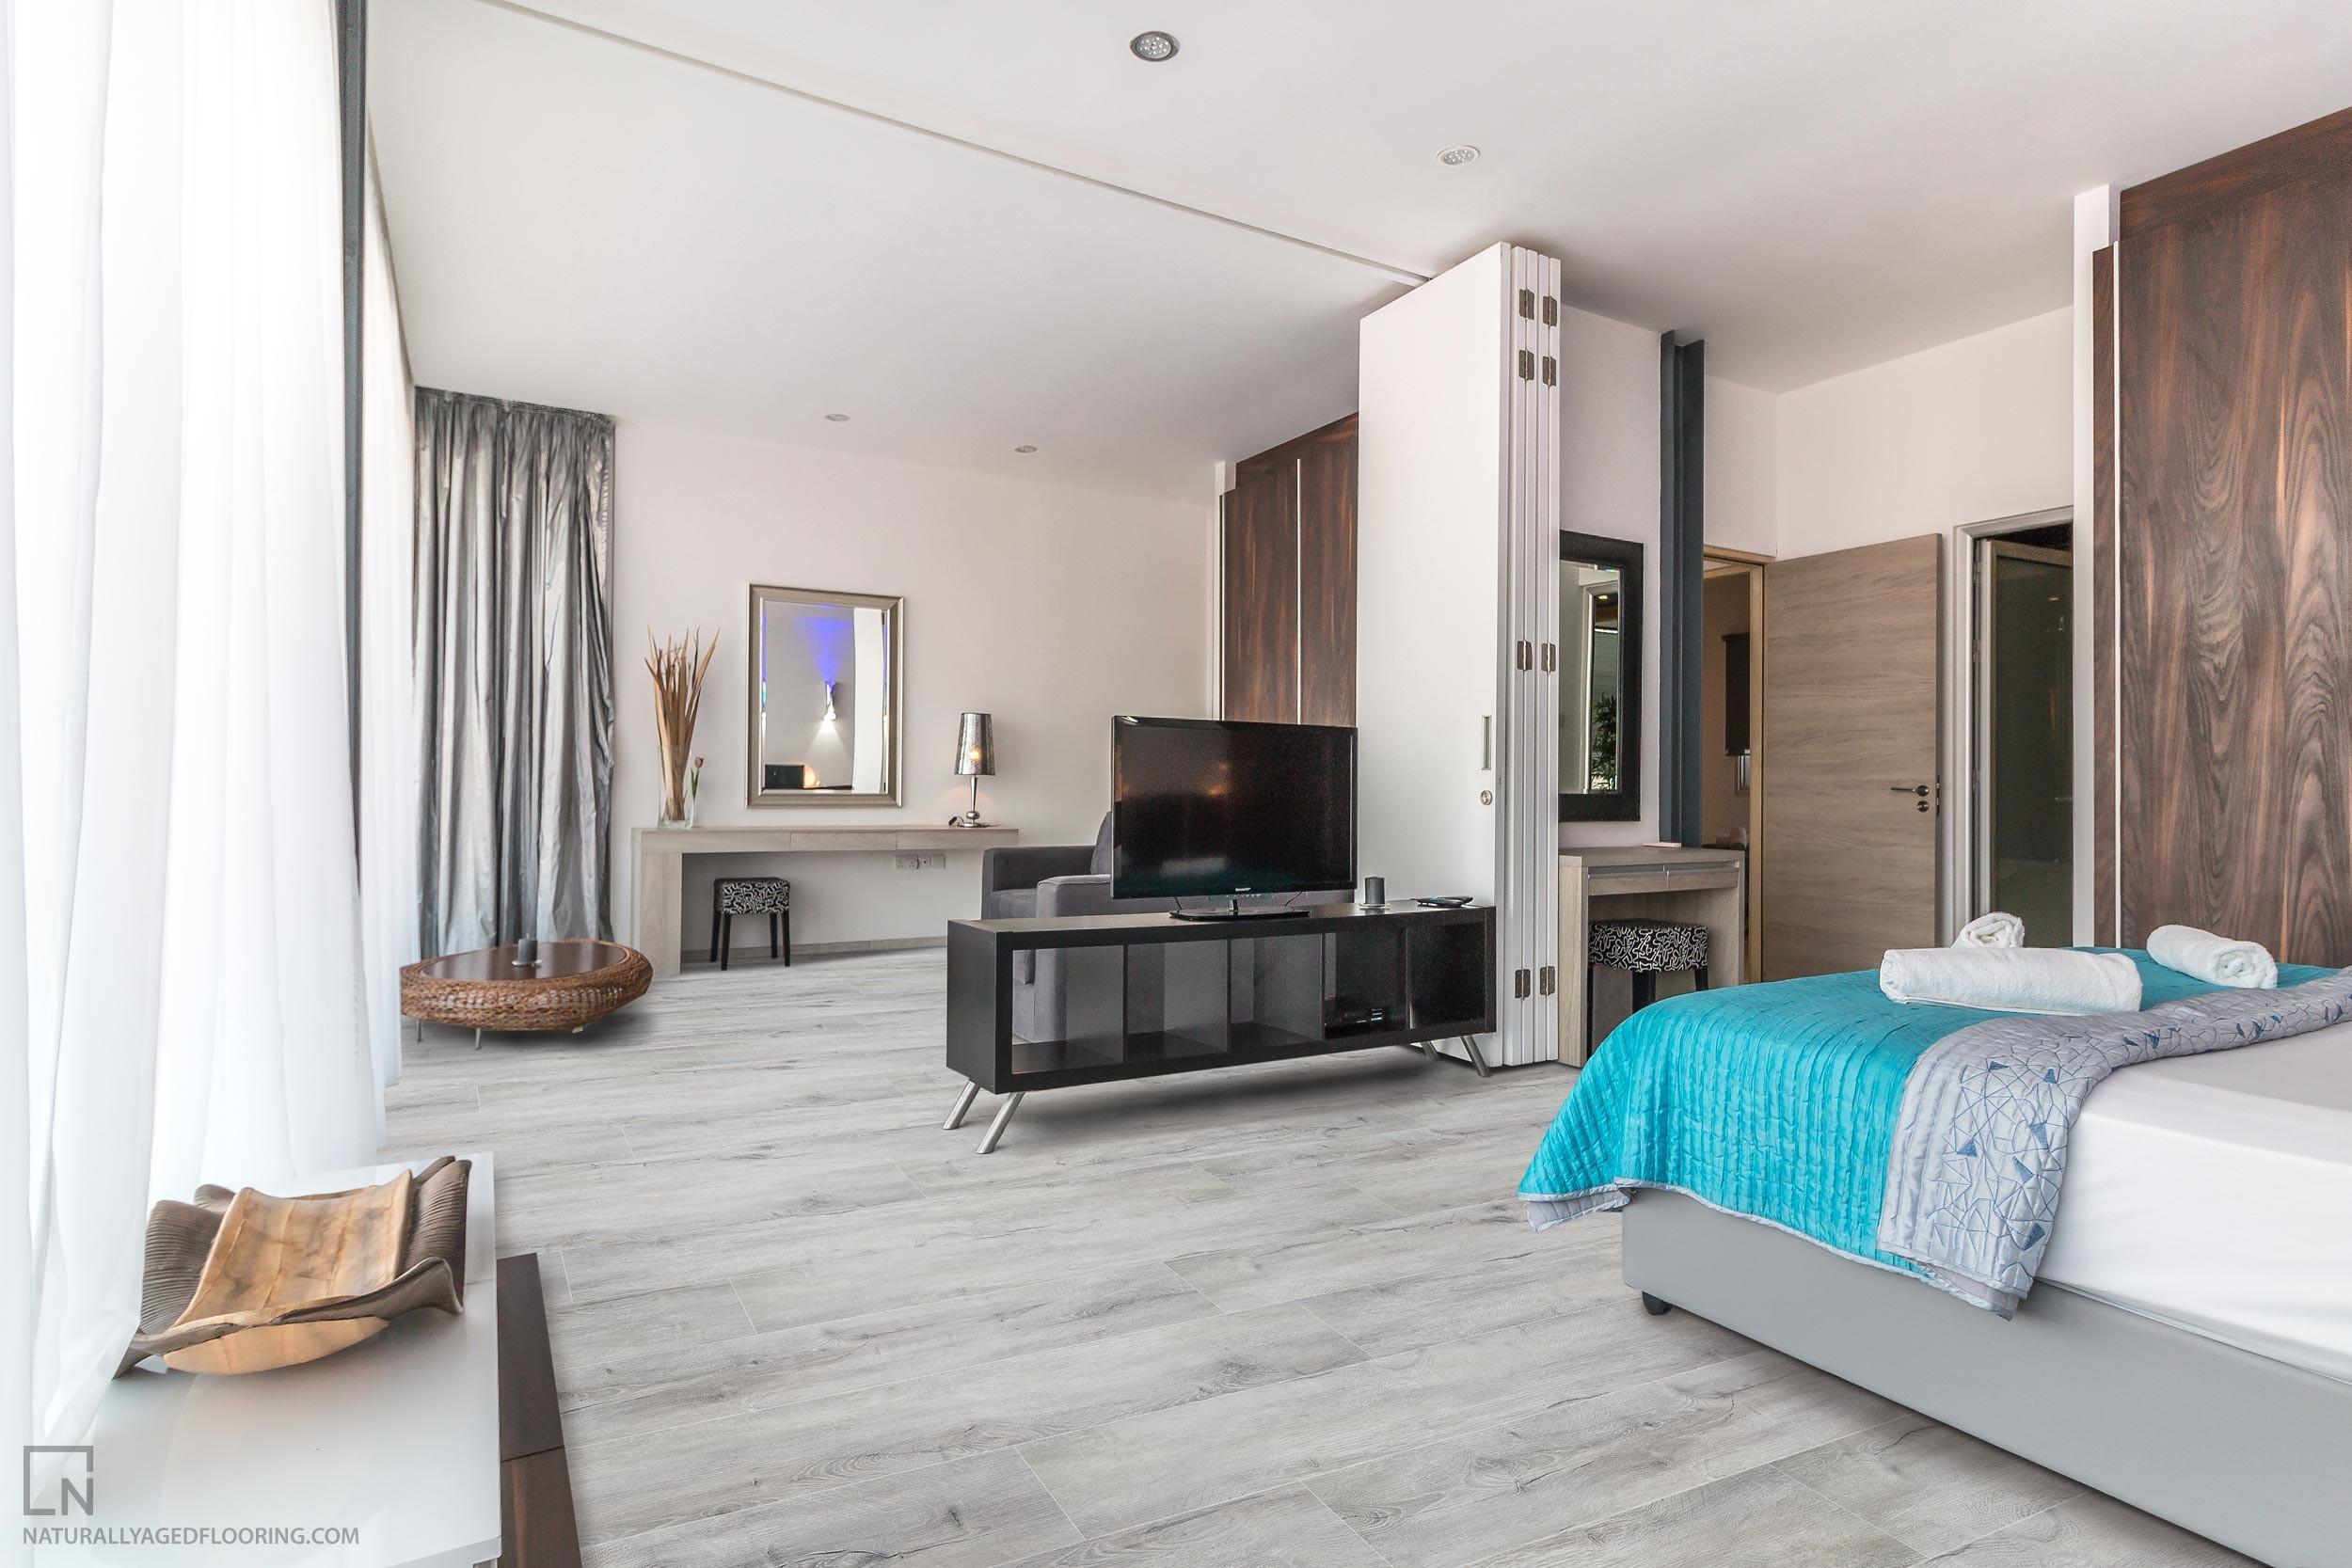 "8"" Granite Grey - Naturally Aged Flooring ™"